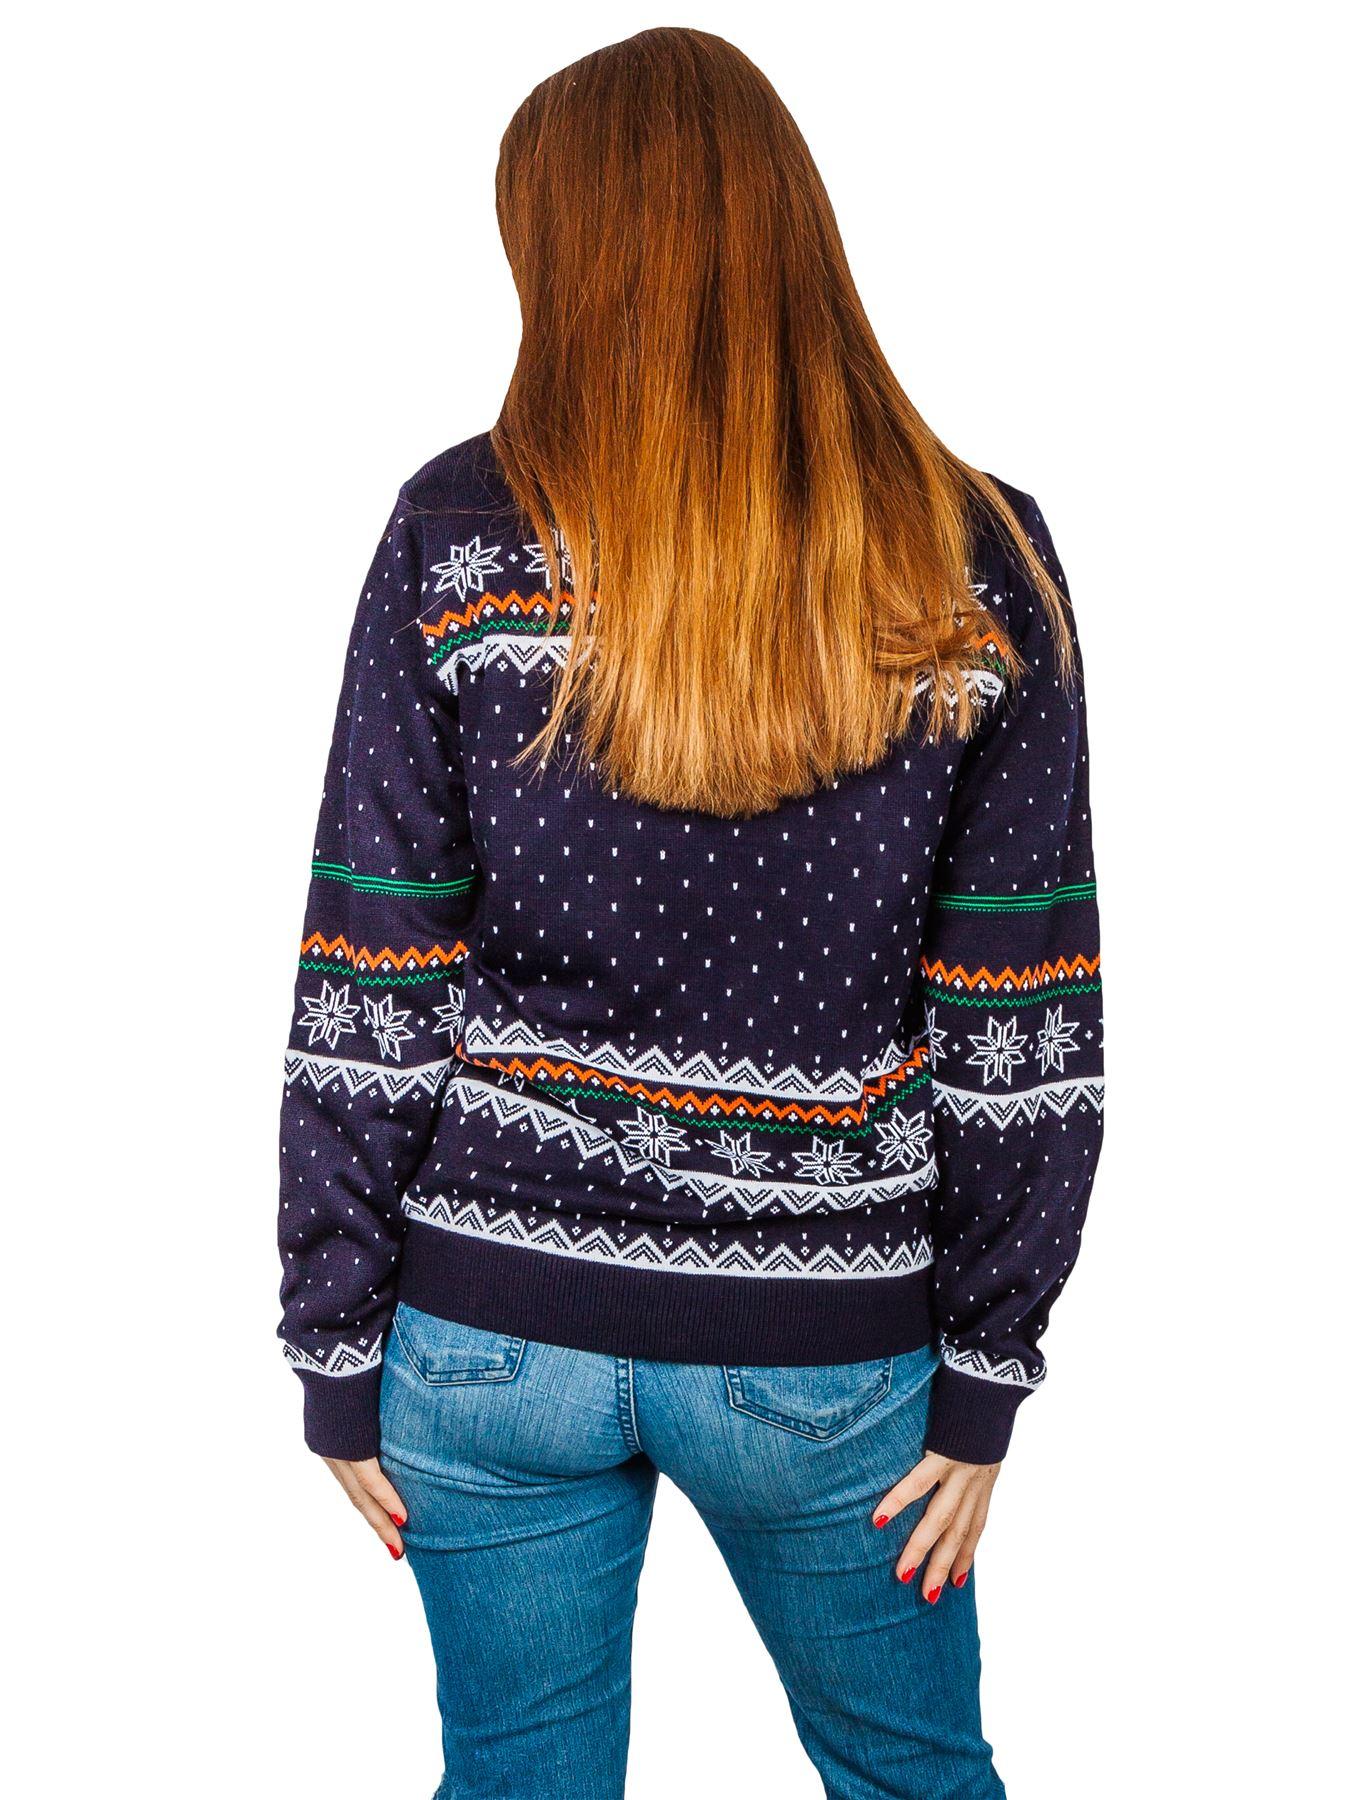 Unisex-Christmas-Jumper-Girls-Boys-Reindeer-Snow-Flake-Knitted-Pullover-Sweater thumbnail 5